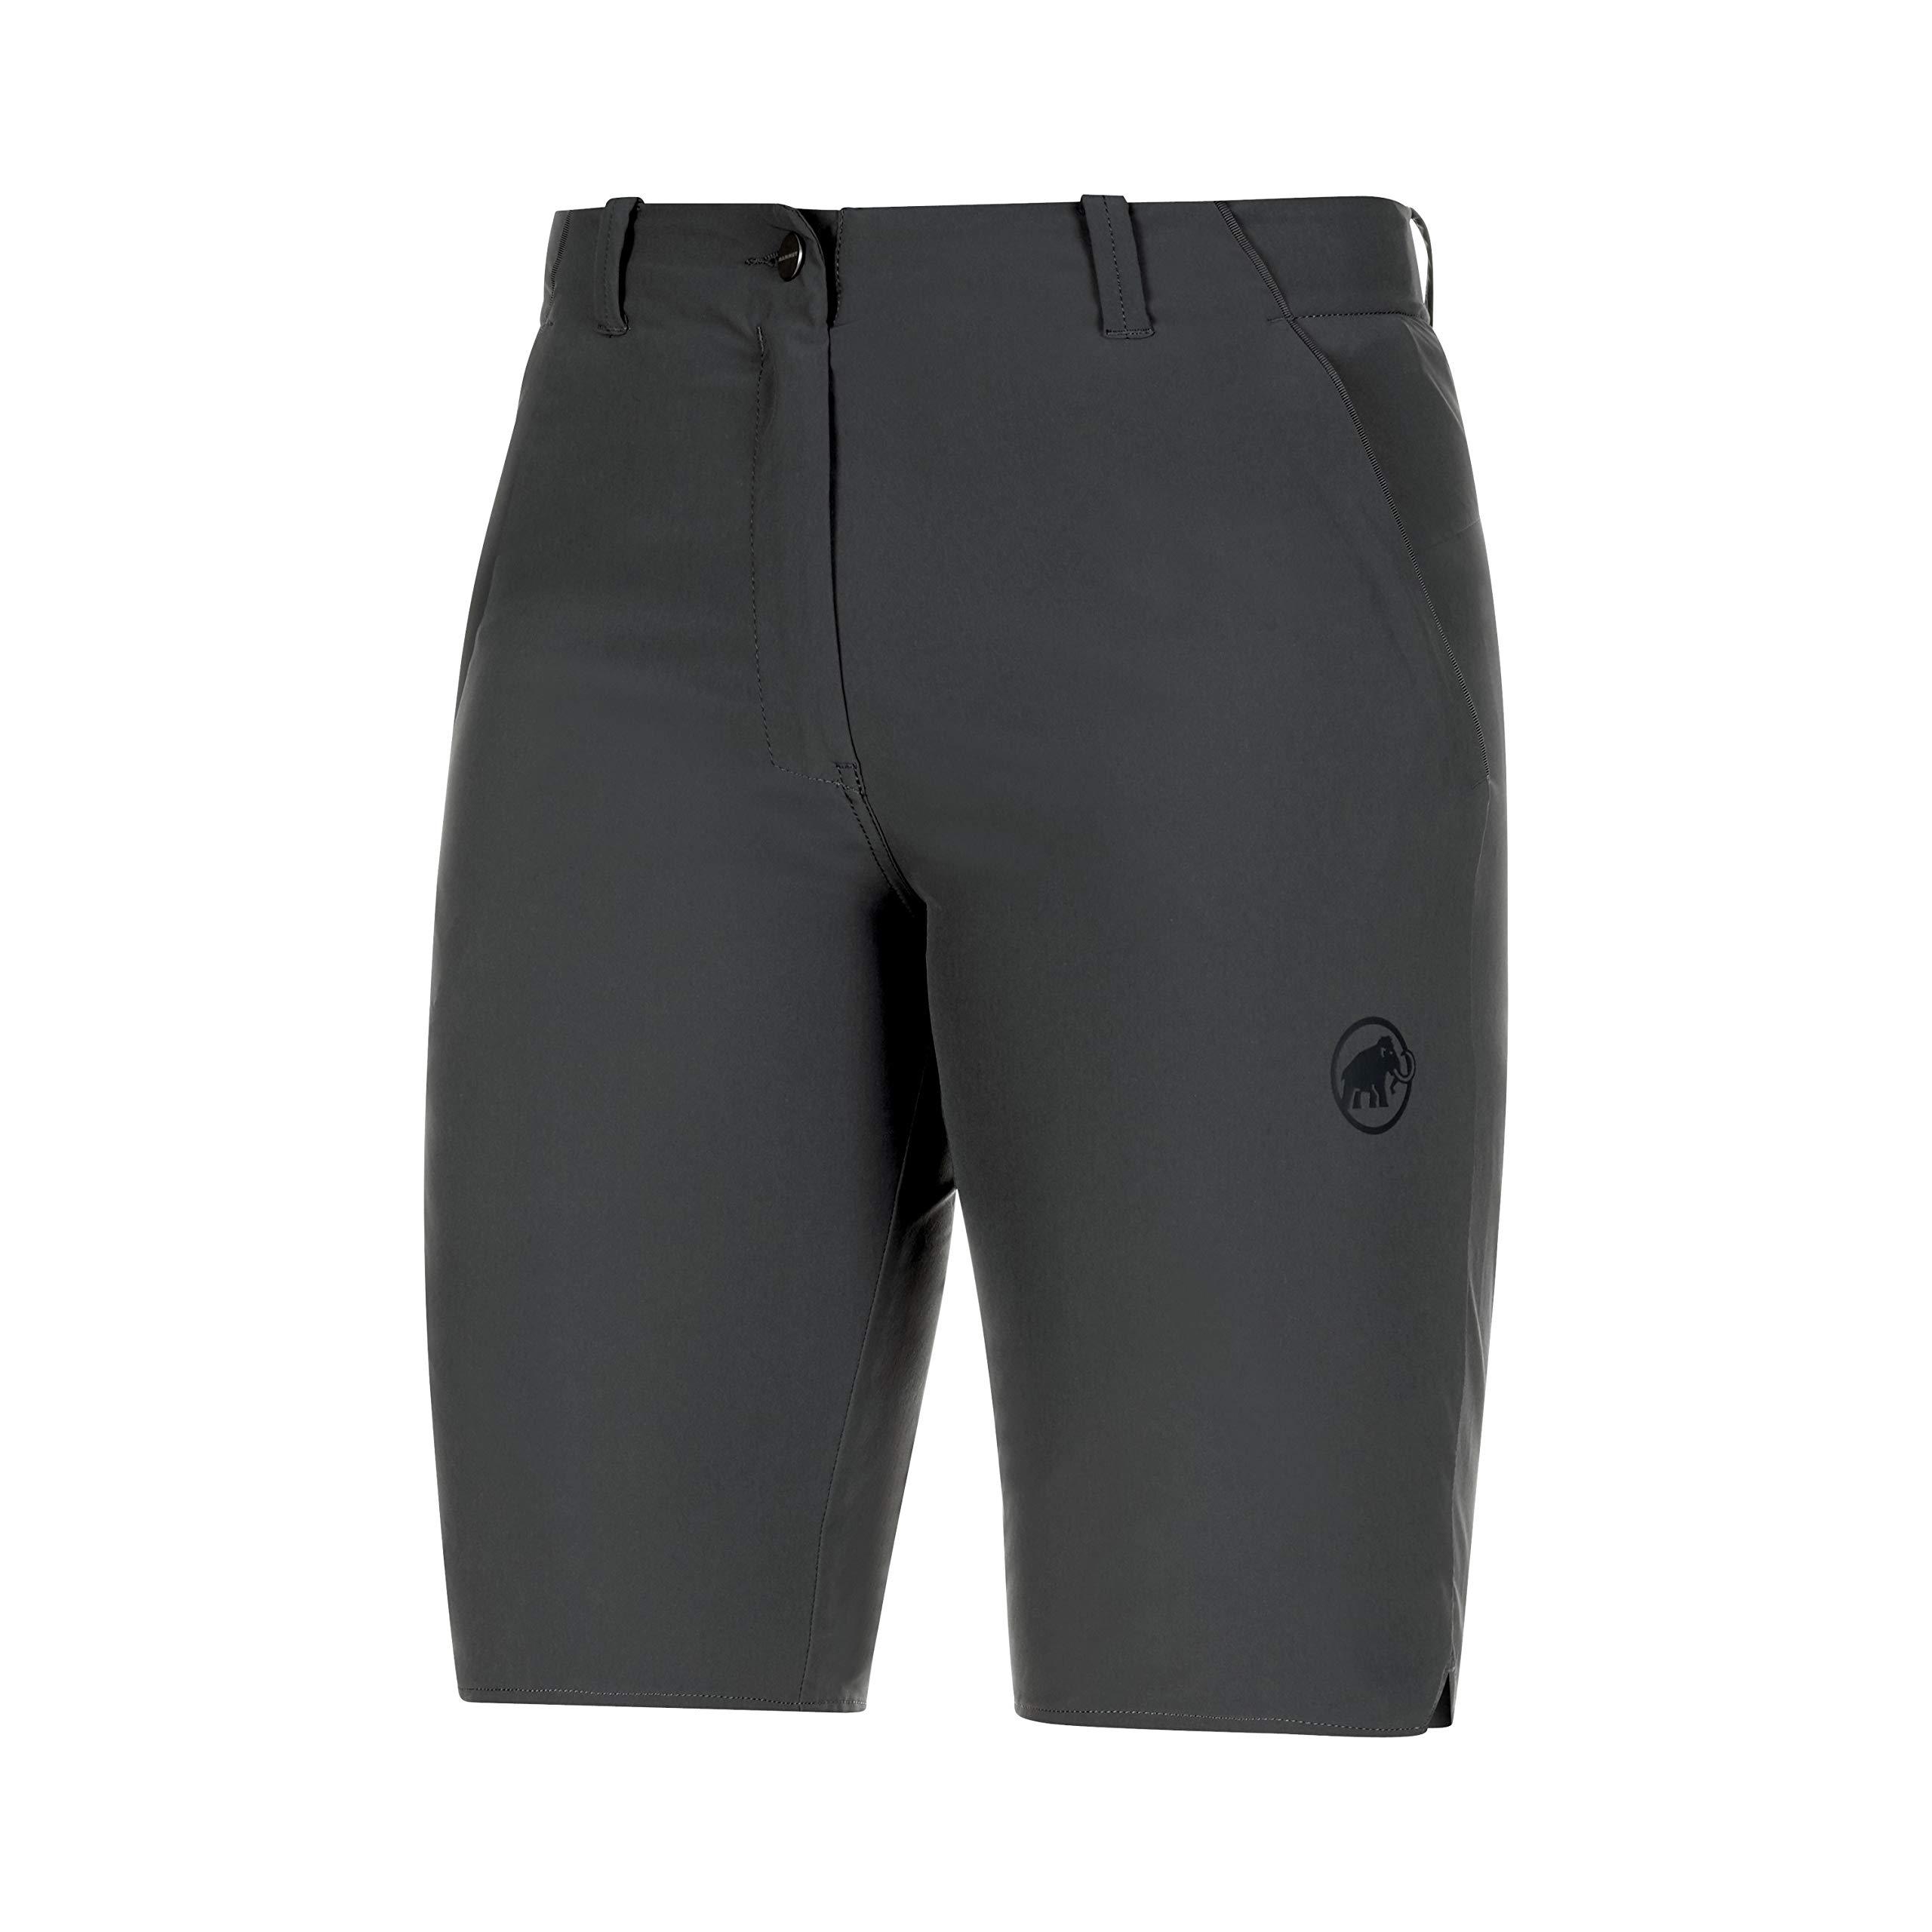 Mammut Damen Shorts Runbold, grau, EU 38